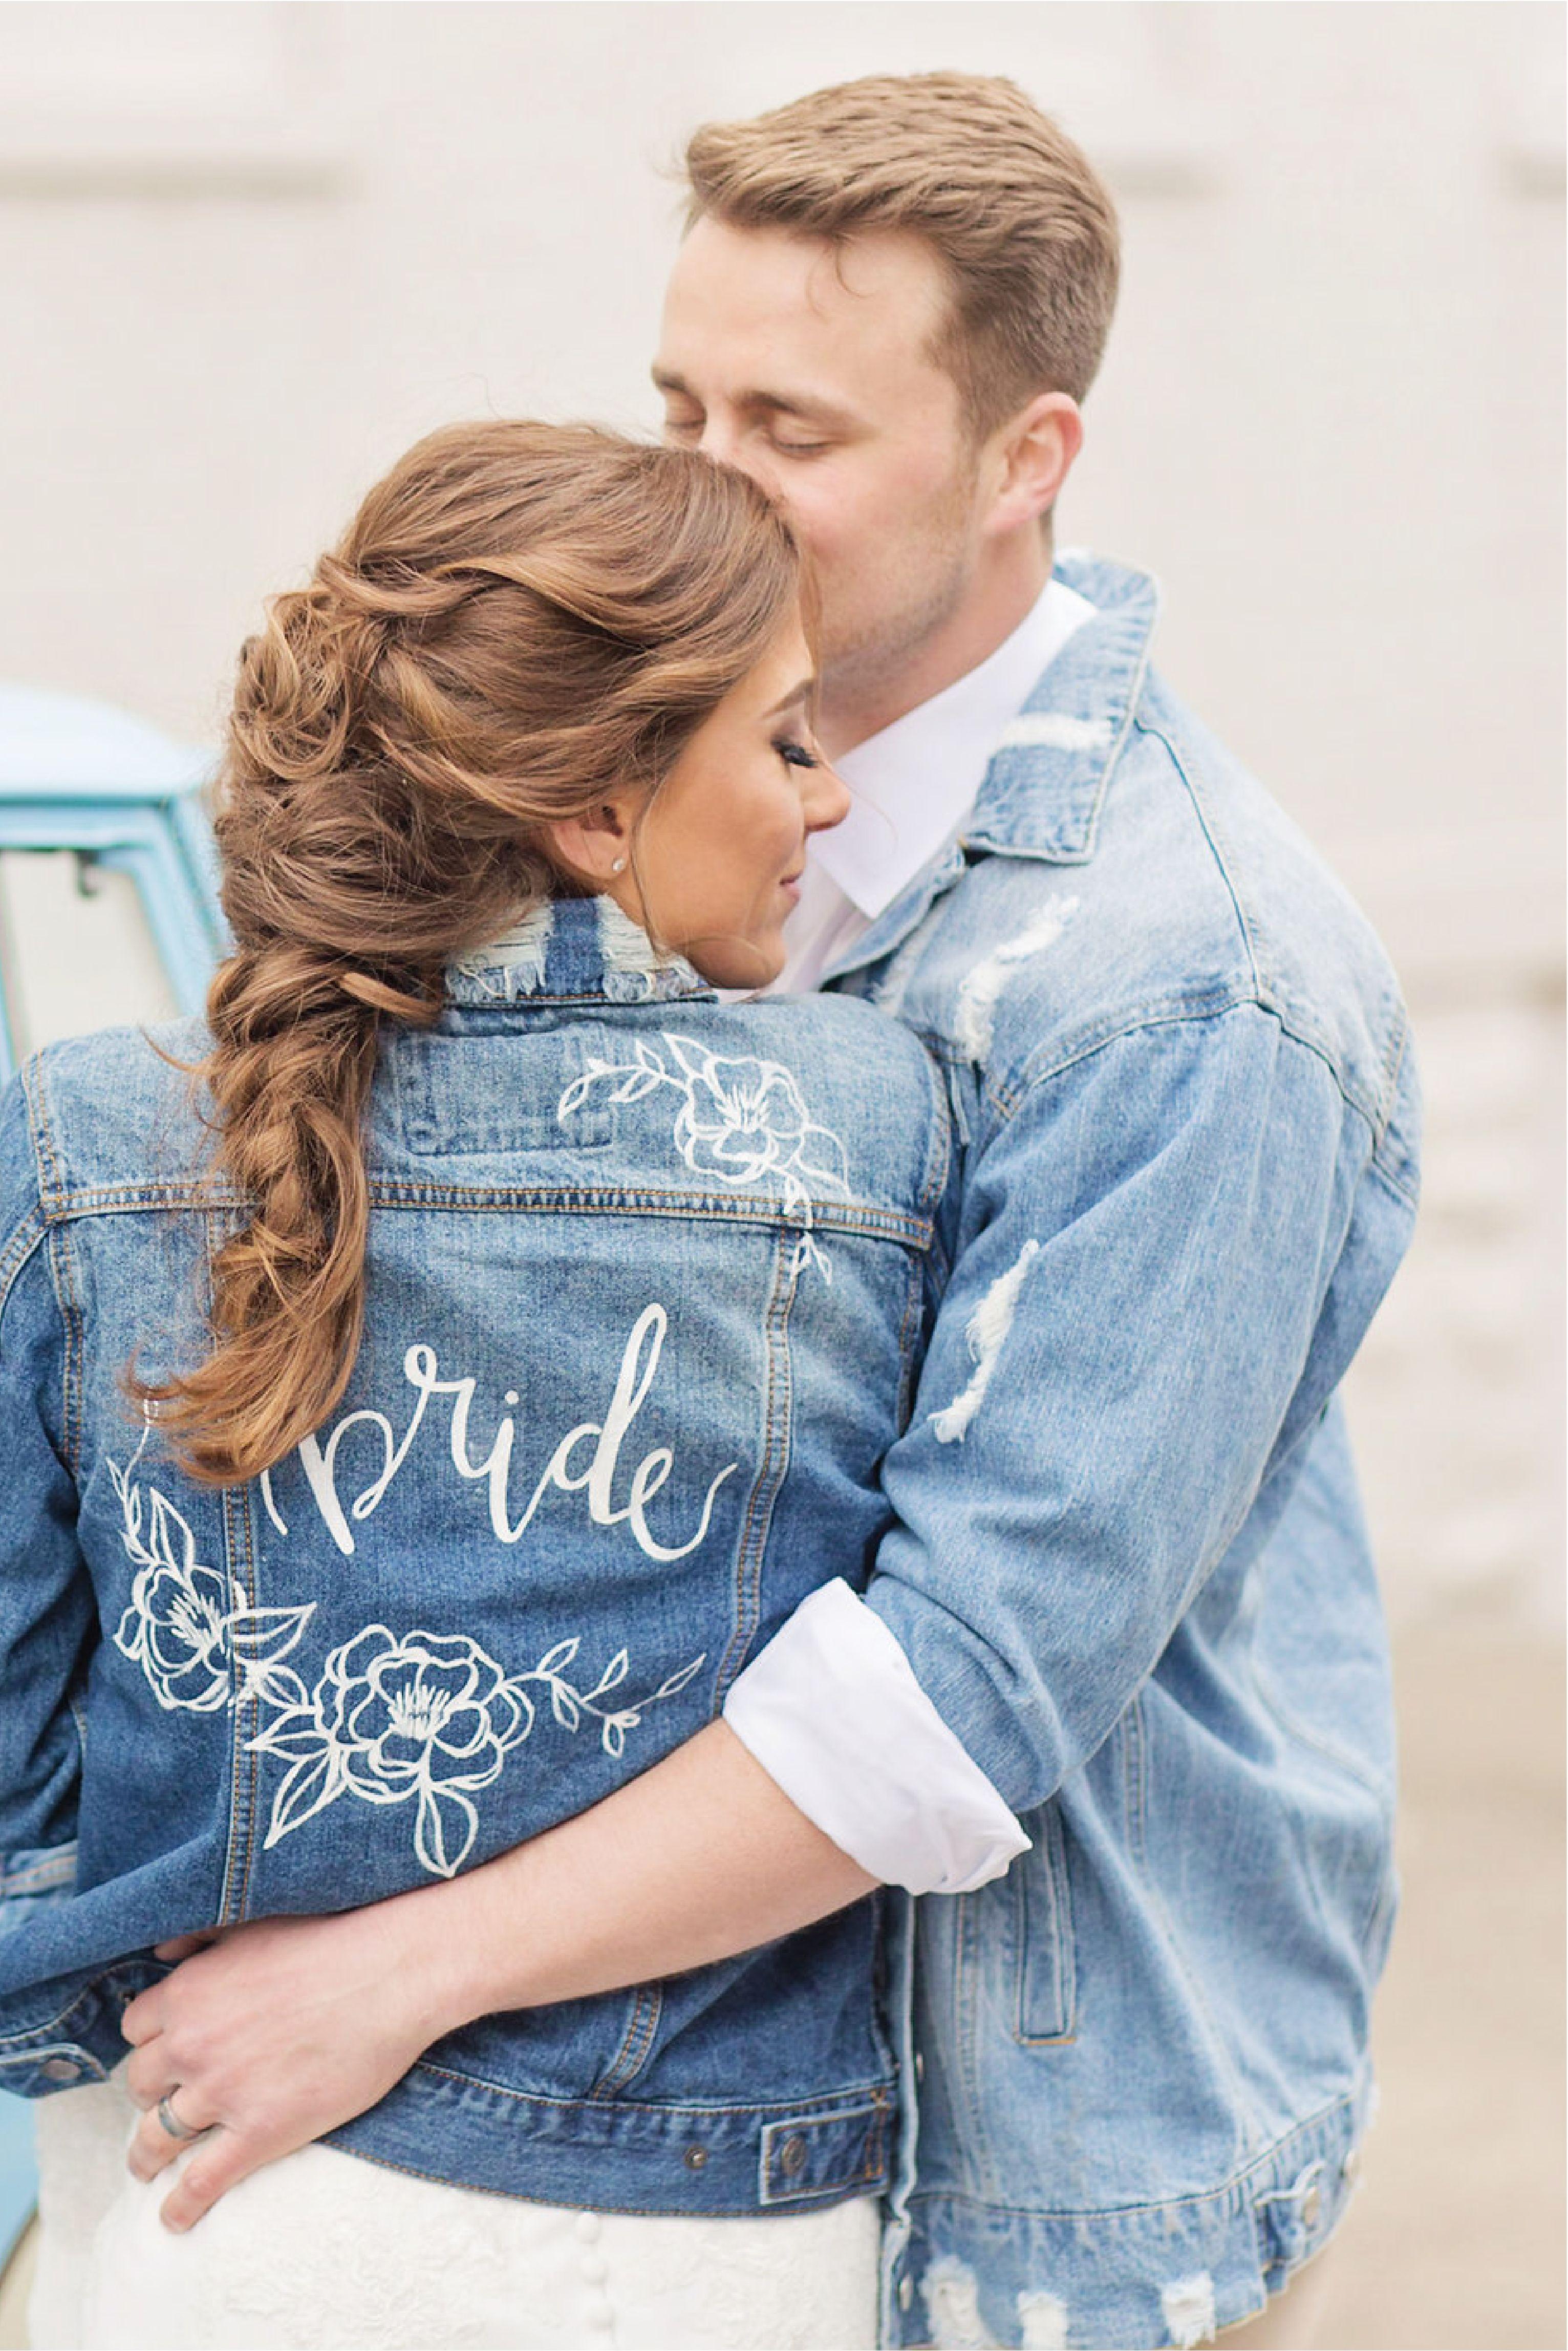 Boho wedding attire. Custom bride and groom jean jacket